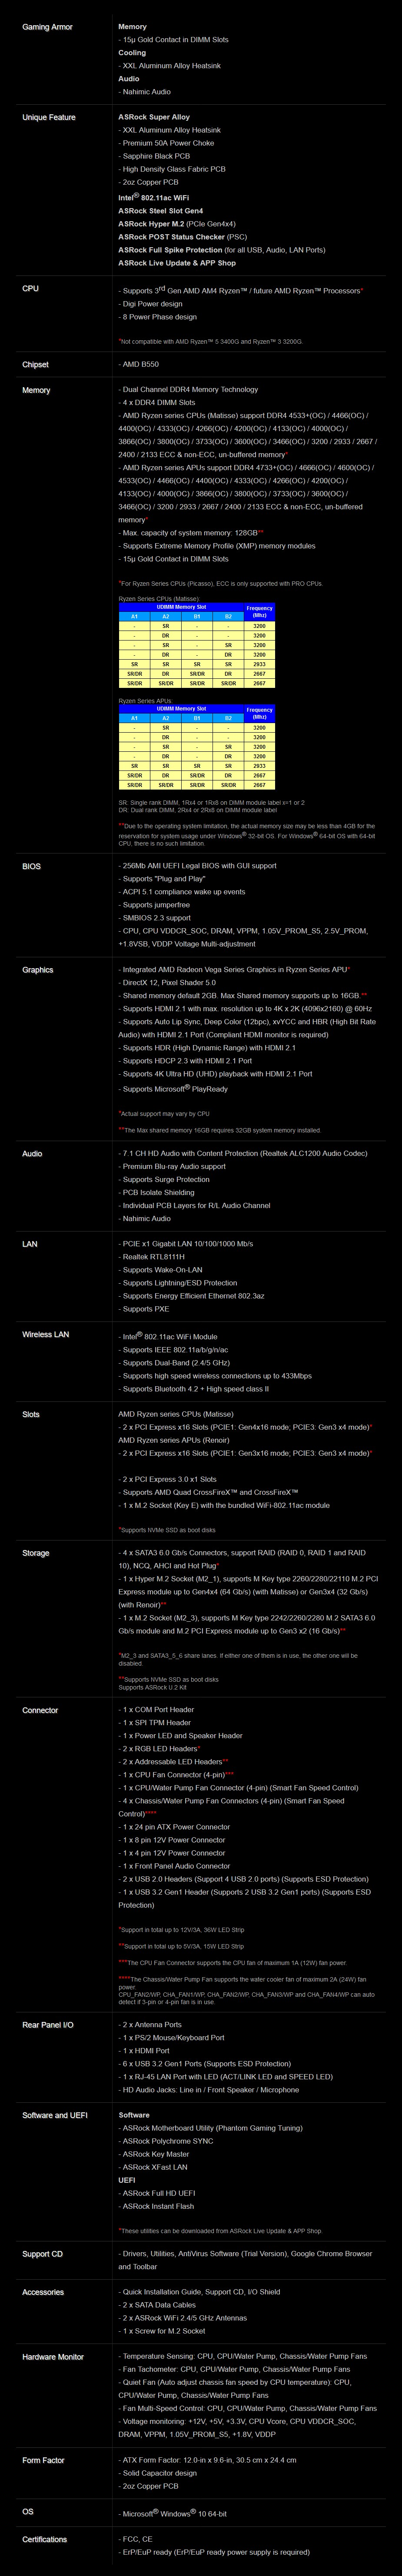 ASRock B550 Phantom Gaming 4/ac AM4 ATX Motherboard - Overview 2